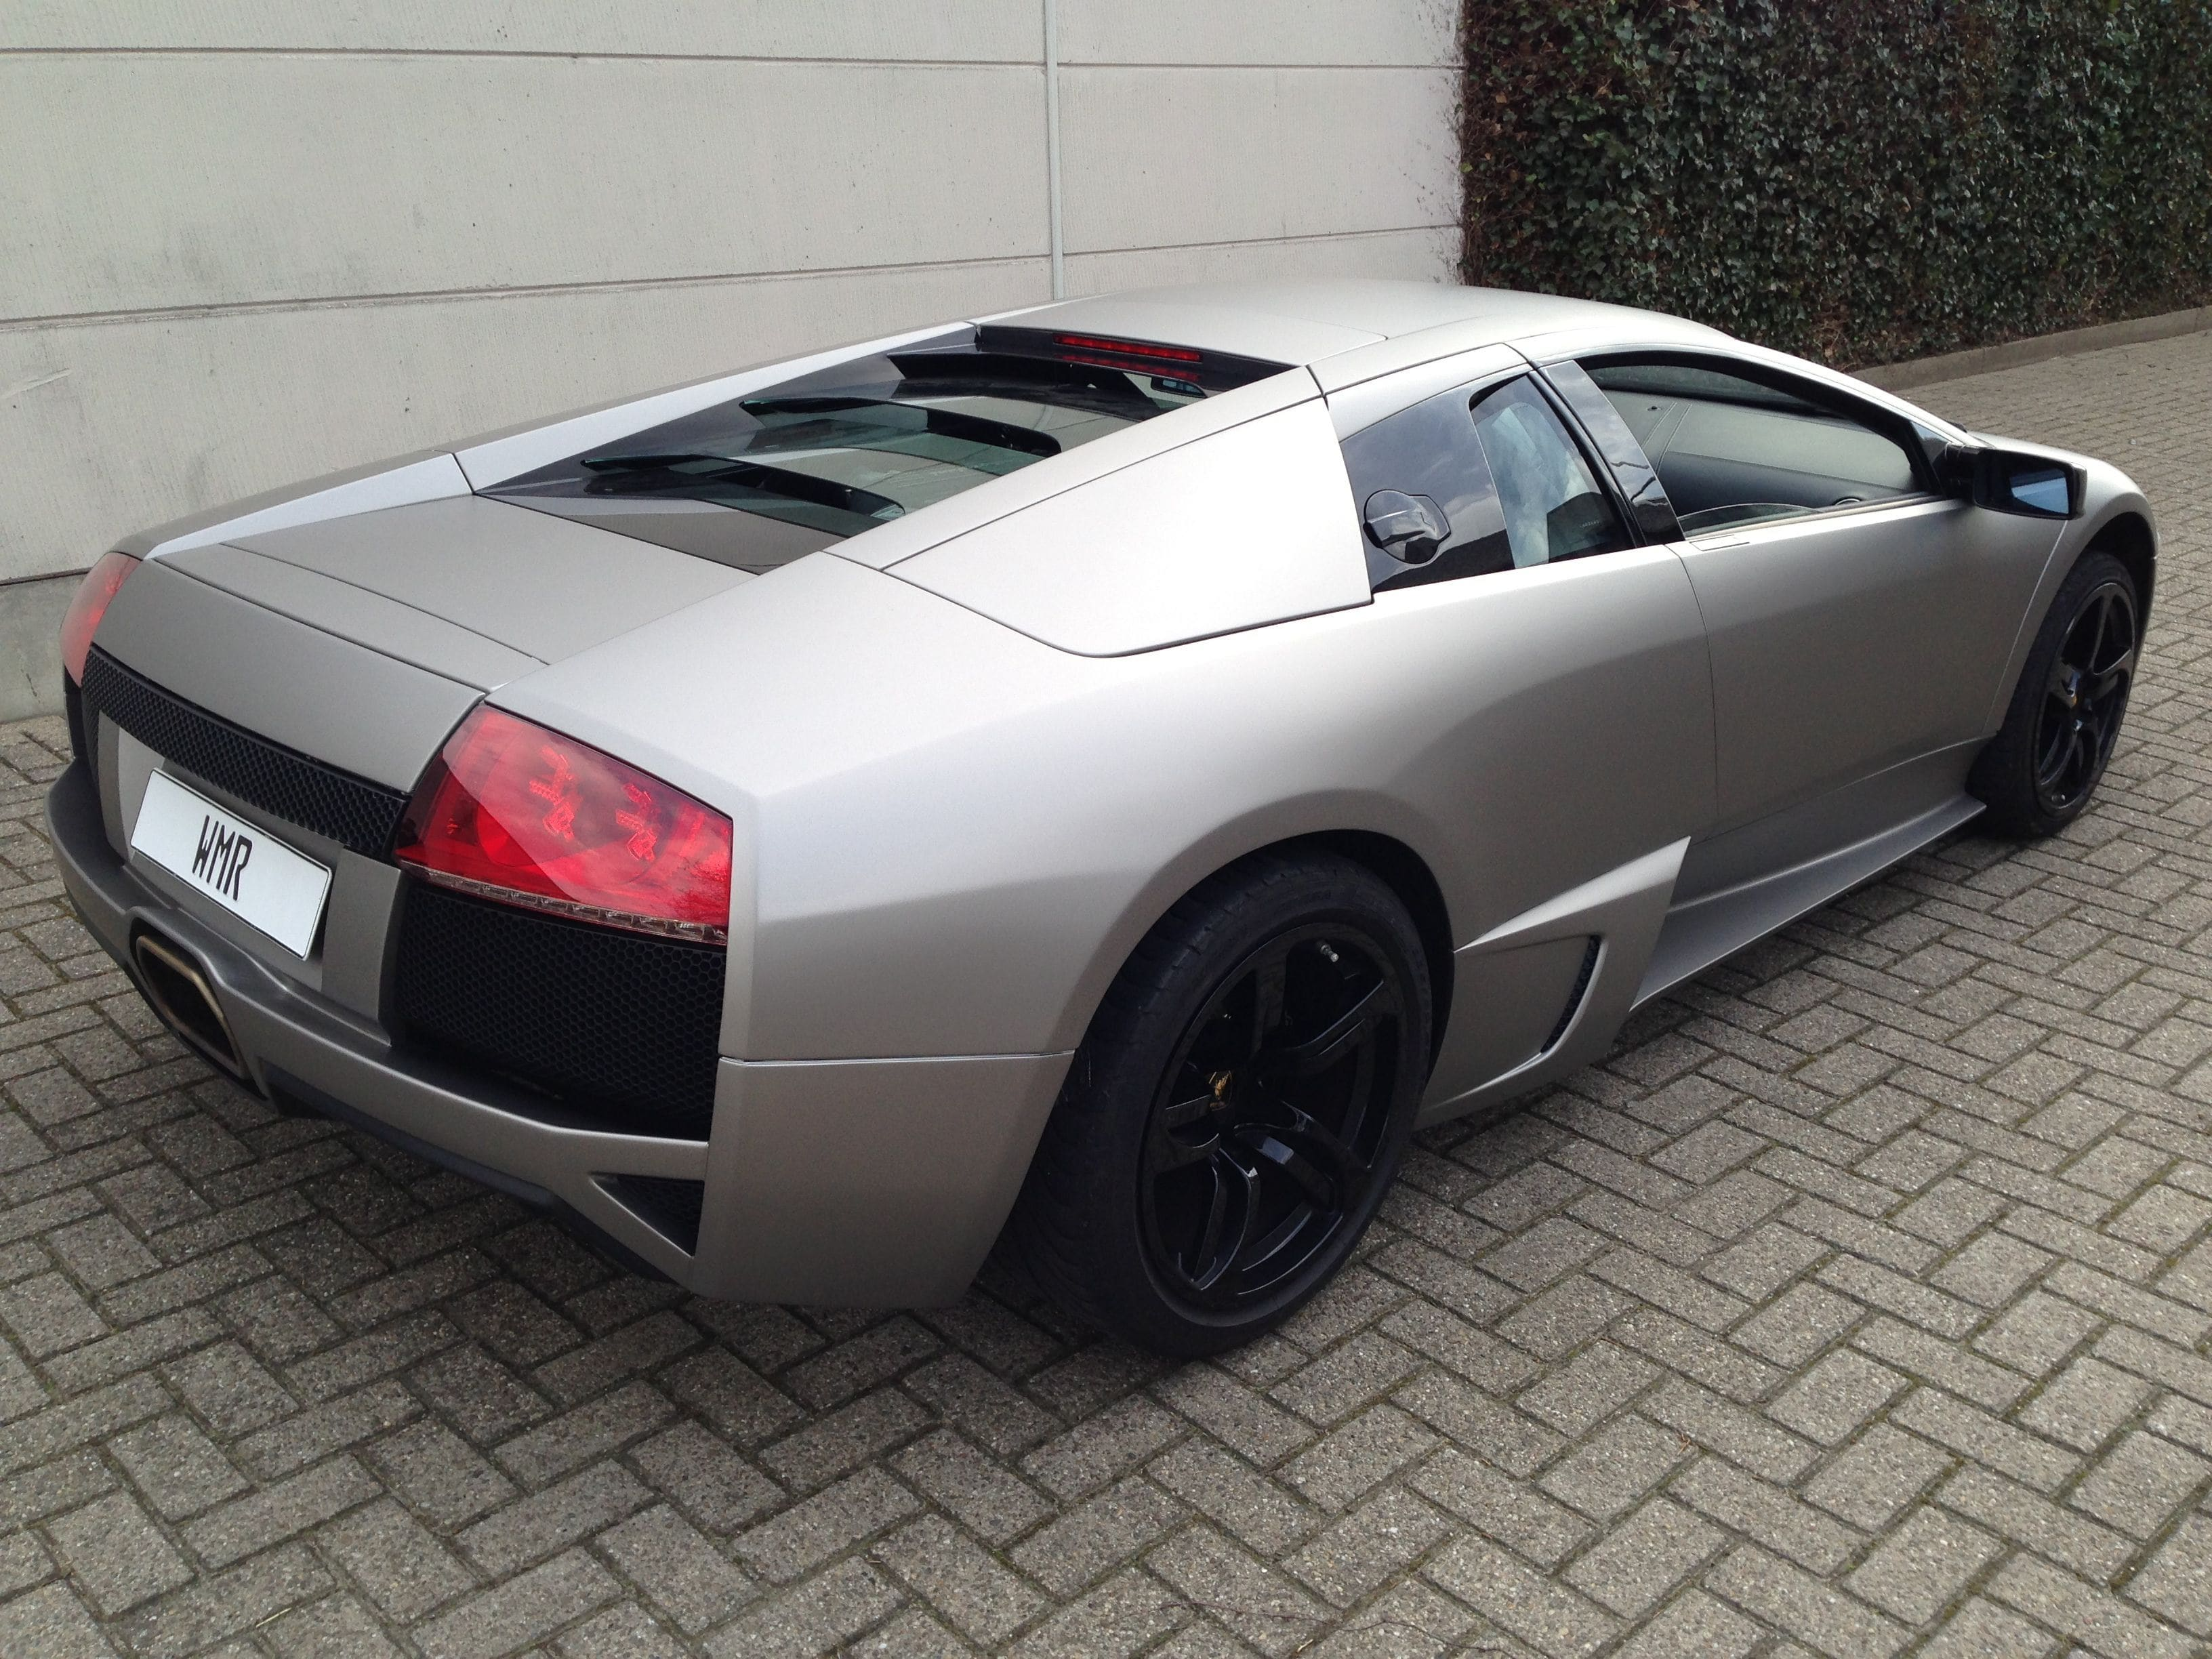 Lamborghini Murcialago LP670 met Gunpowder Wrap, Carwrapping door Wrapmyride.nu Foto-nr:5985, ©2021